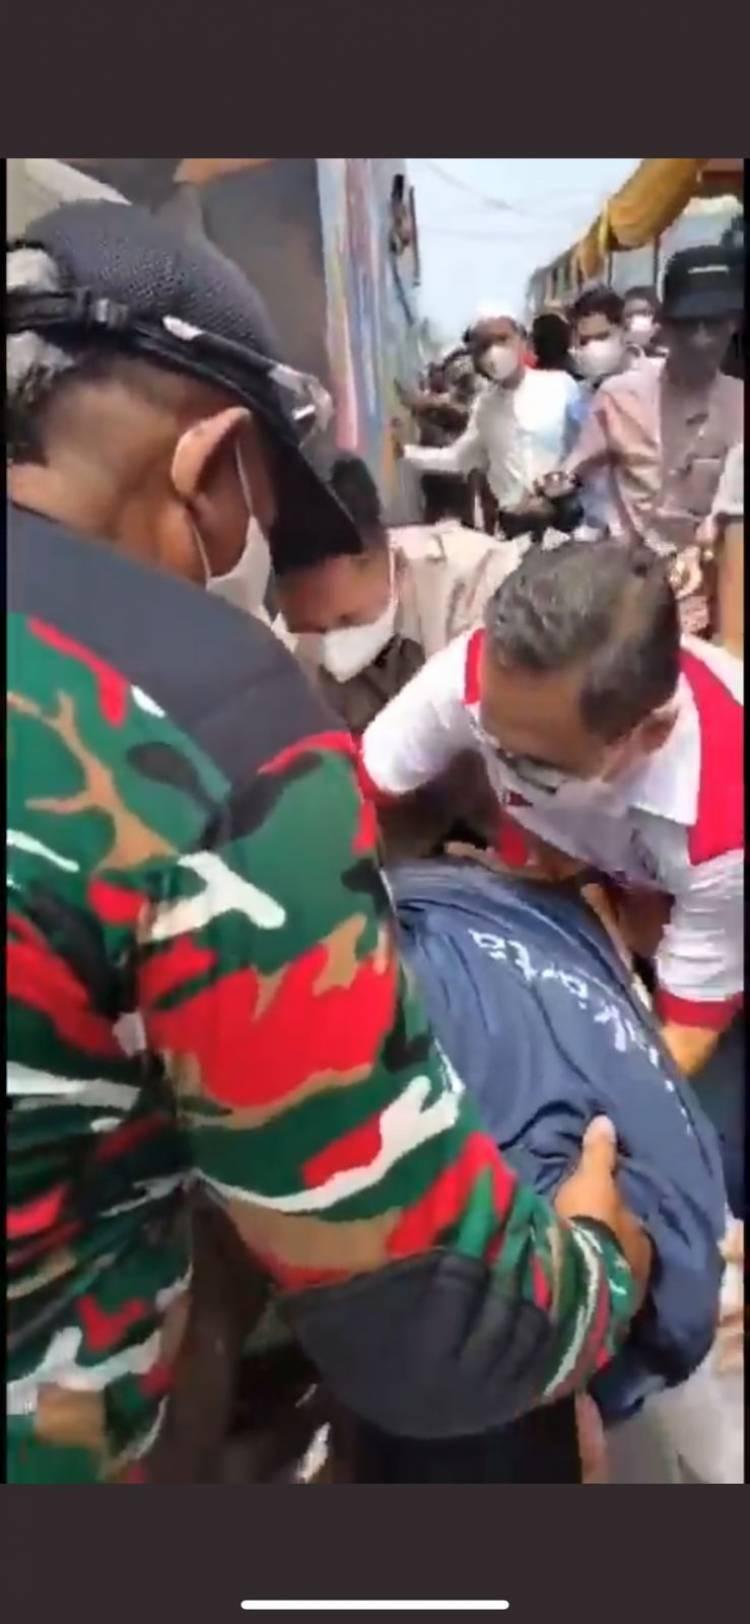 Anies Baswedan Kecebur Got Usai Tinjau Vaksinasi, Netizen : Pertanda Jadi Presiden